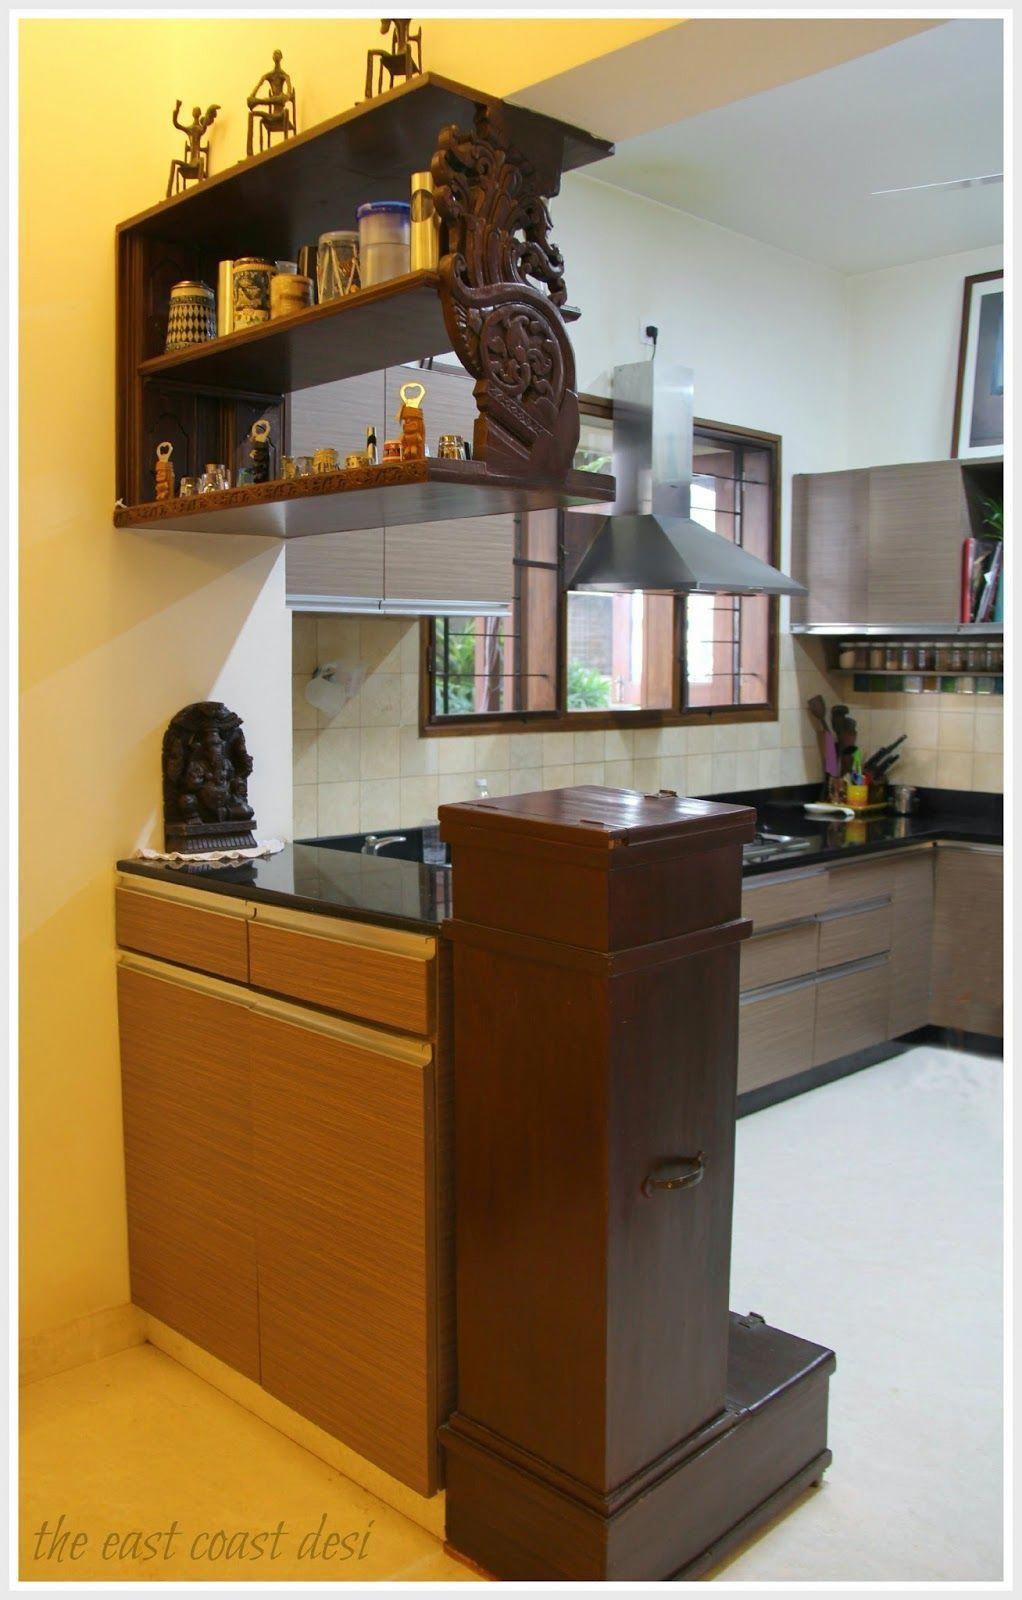 more ideas below kitchenremodel kitchenideas indian modular kitchen ideas small modular ki on kitchen remodel apps id=30194